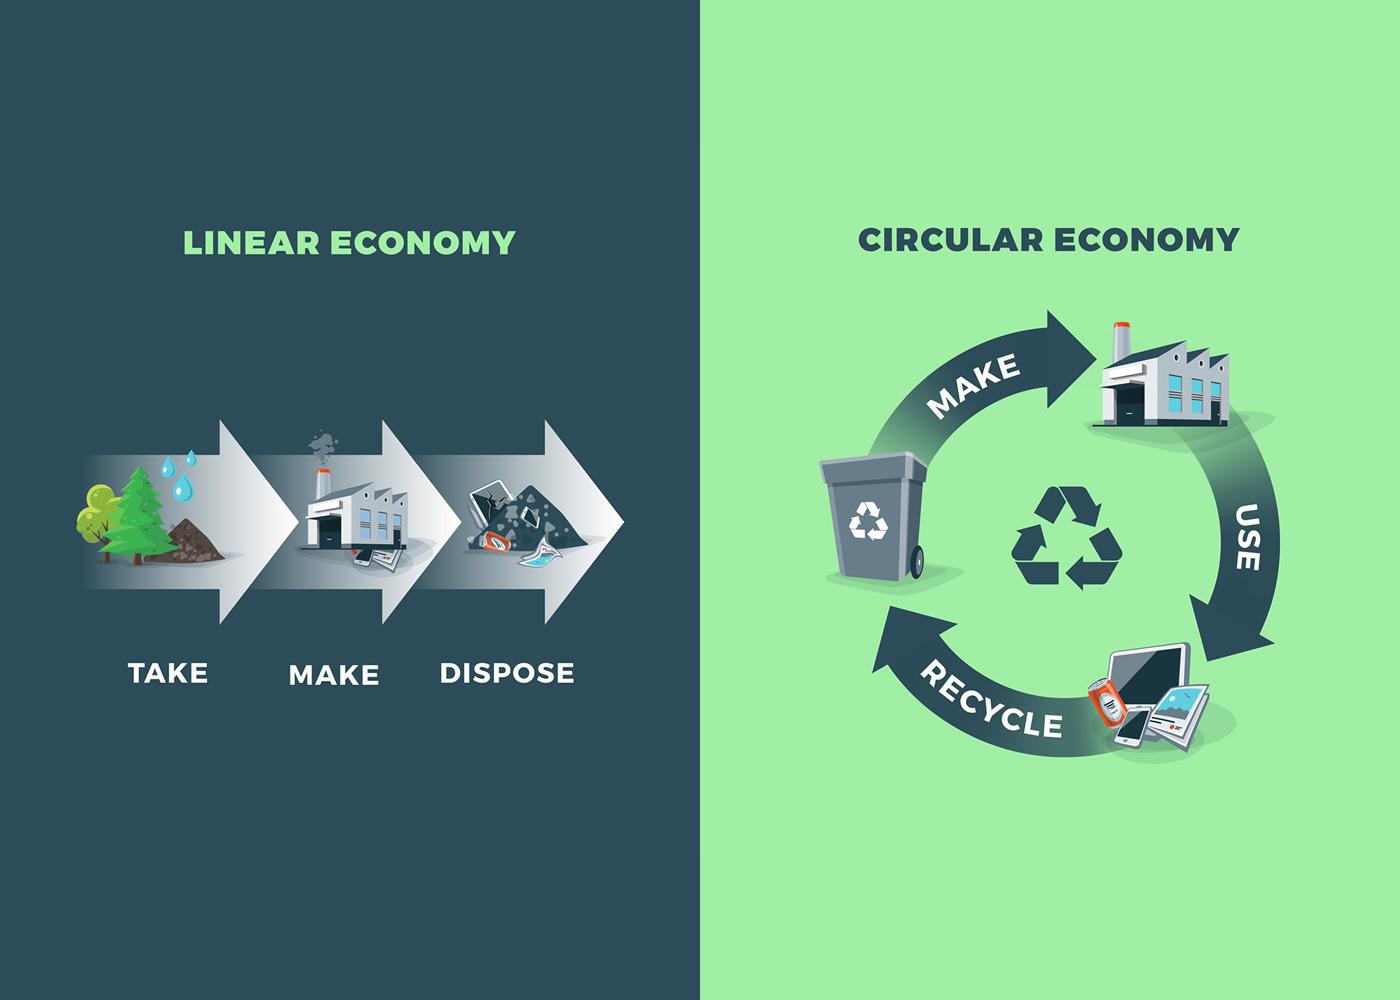 naem-2018-qanda-comparing-circular-linear-economy-showing-product-700x500